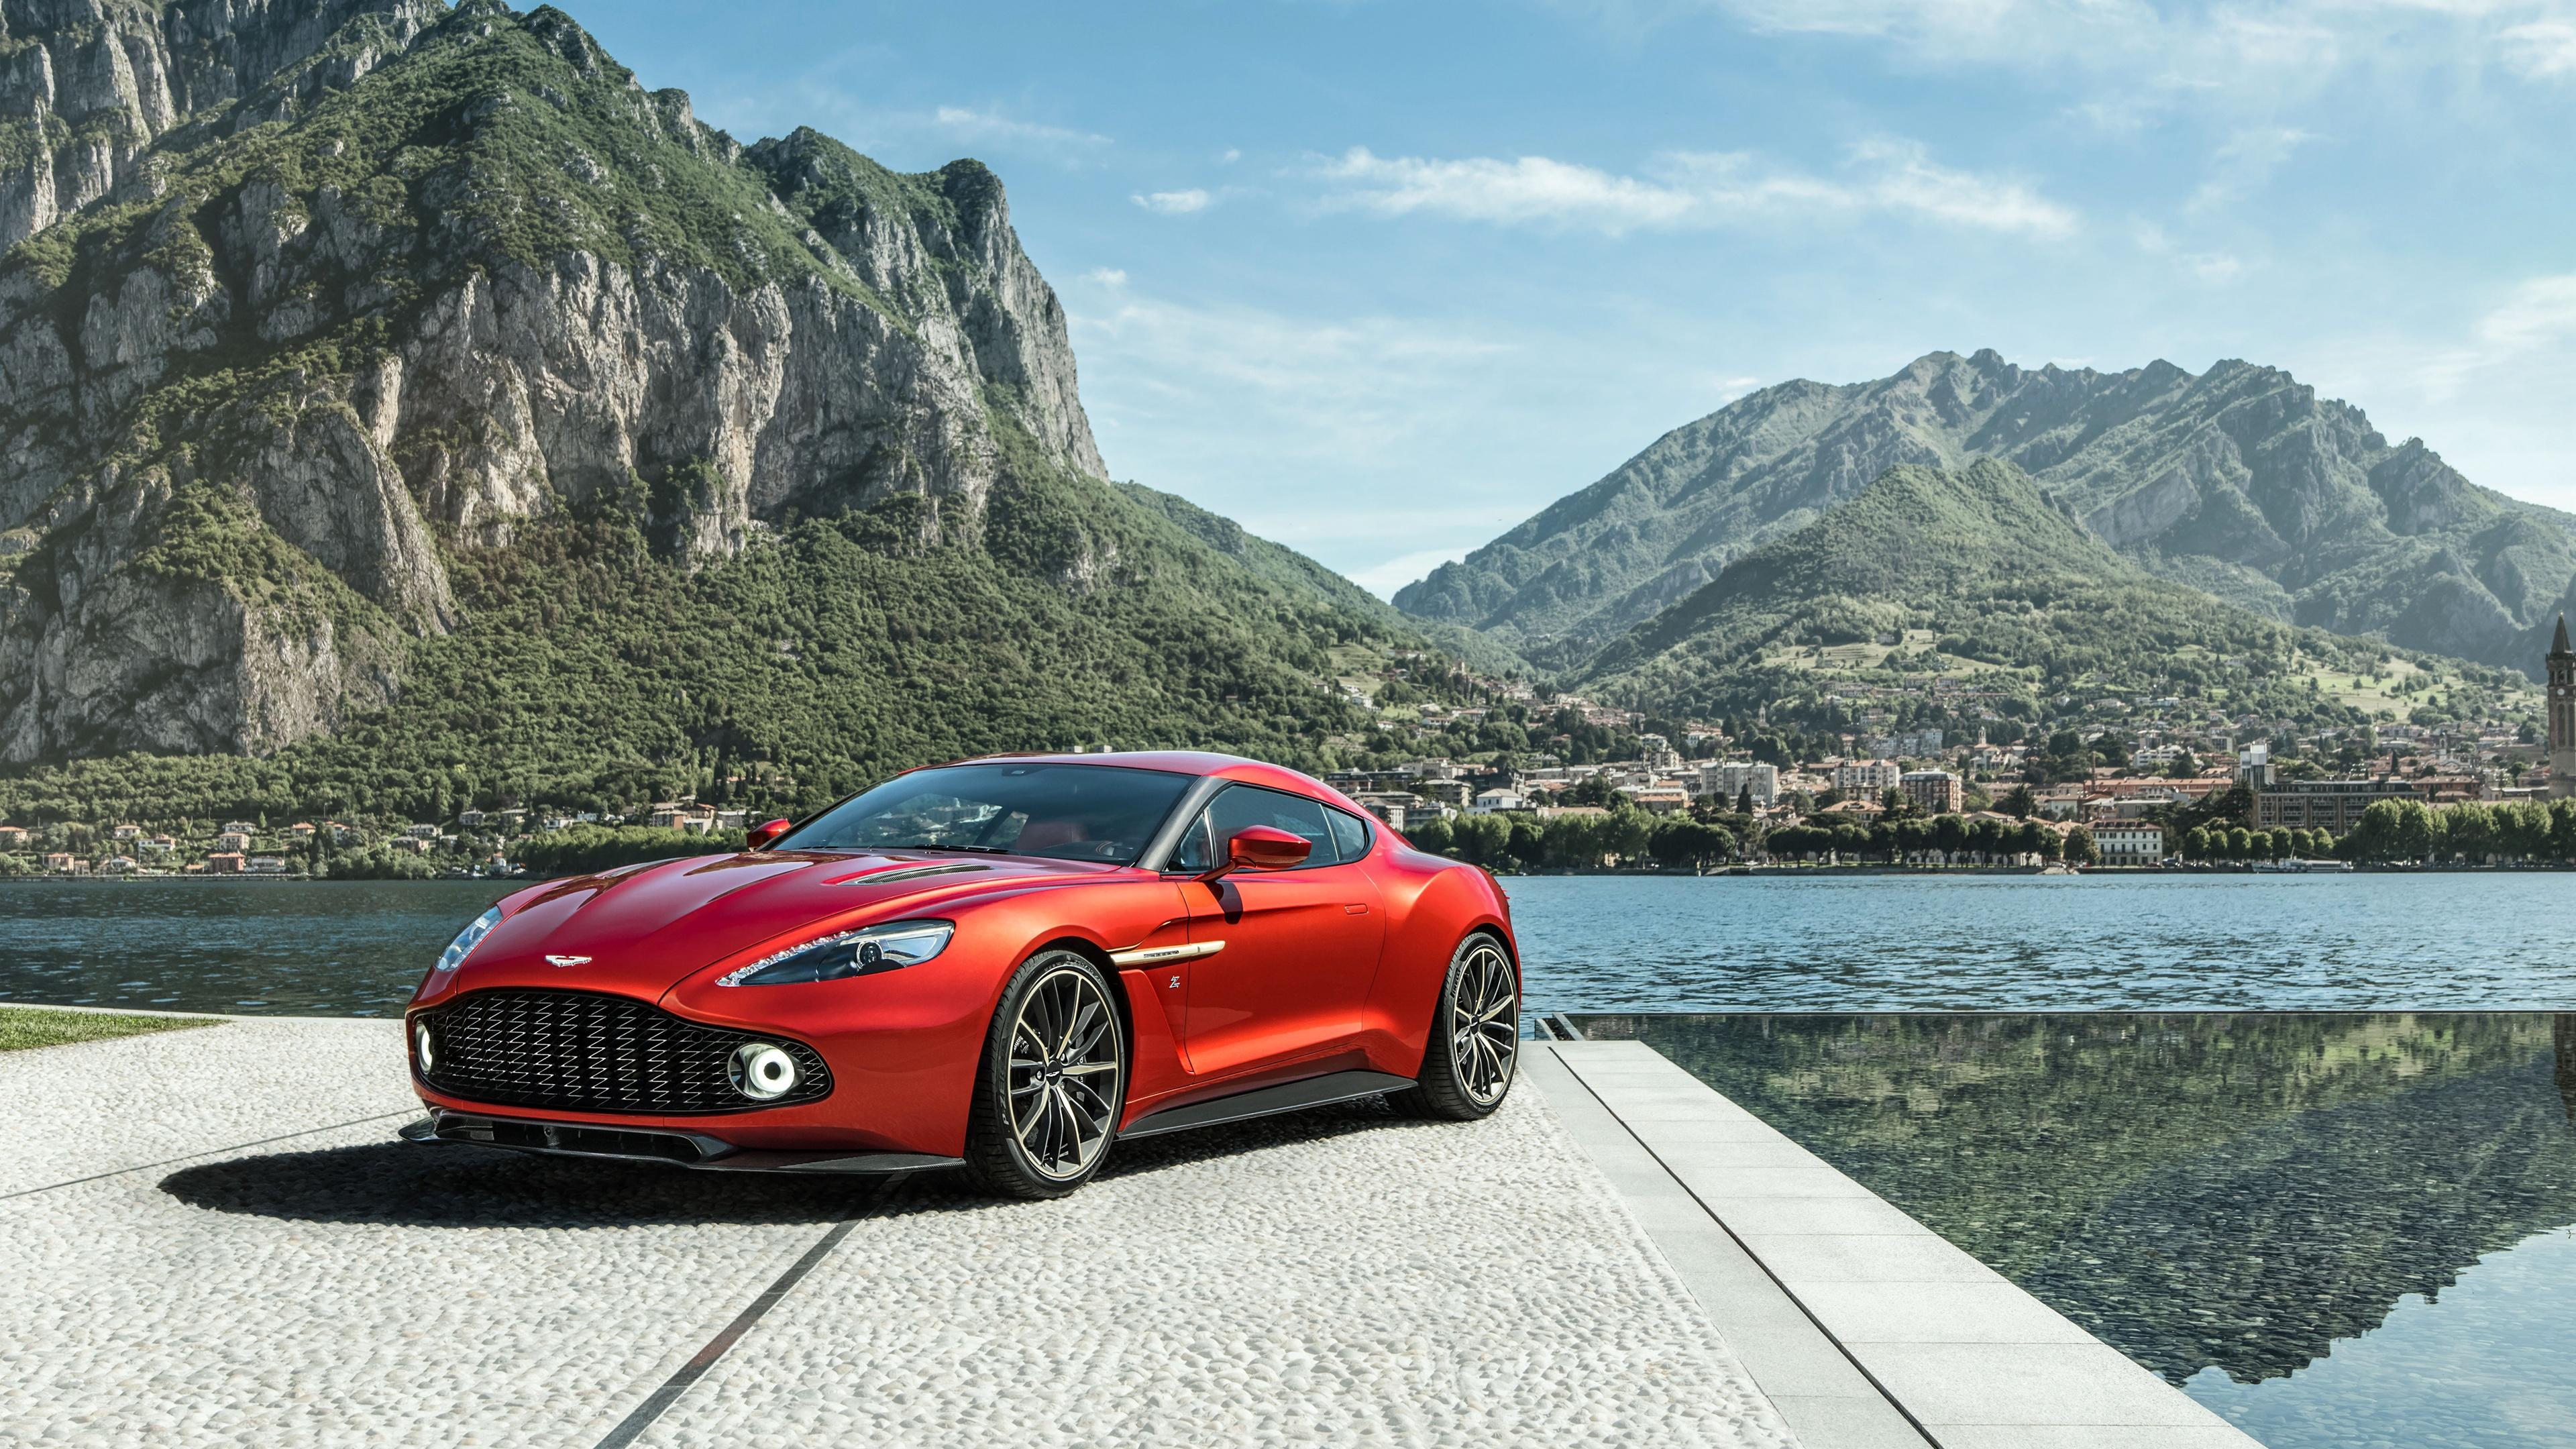 Aston Martin Vanquish Wallpaper for Free HD Desktop Wallpaper